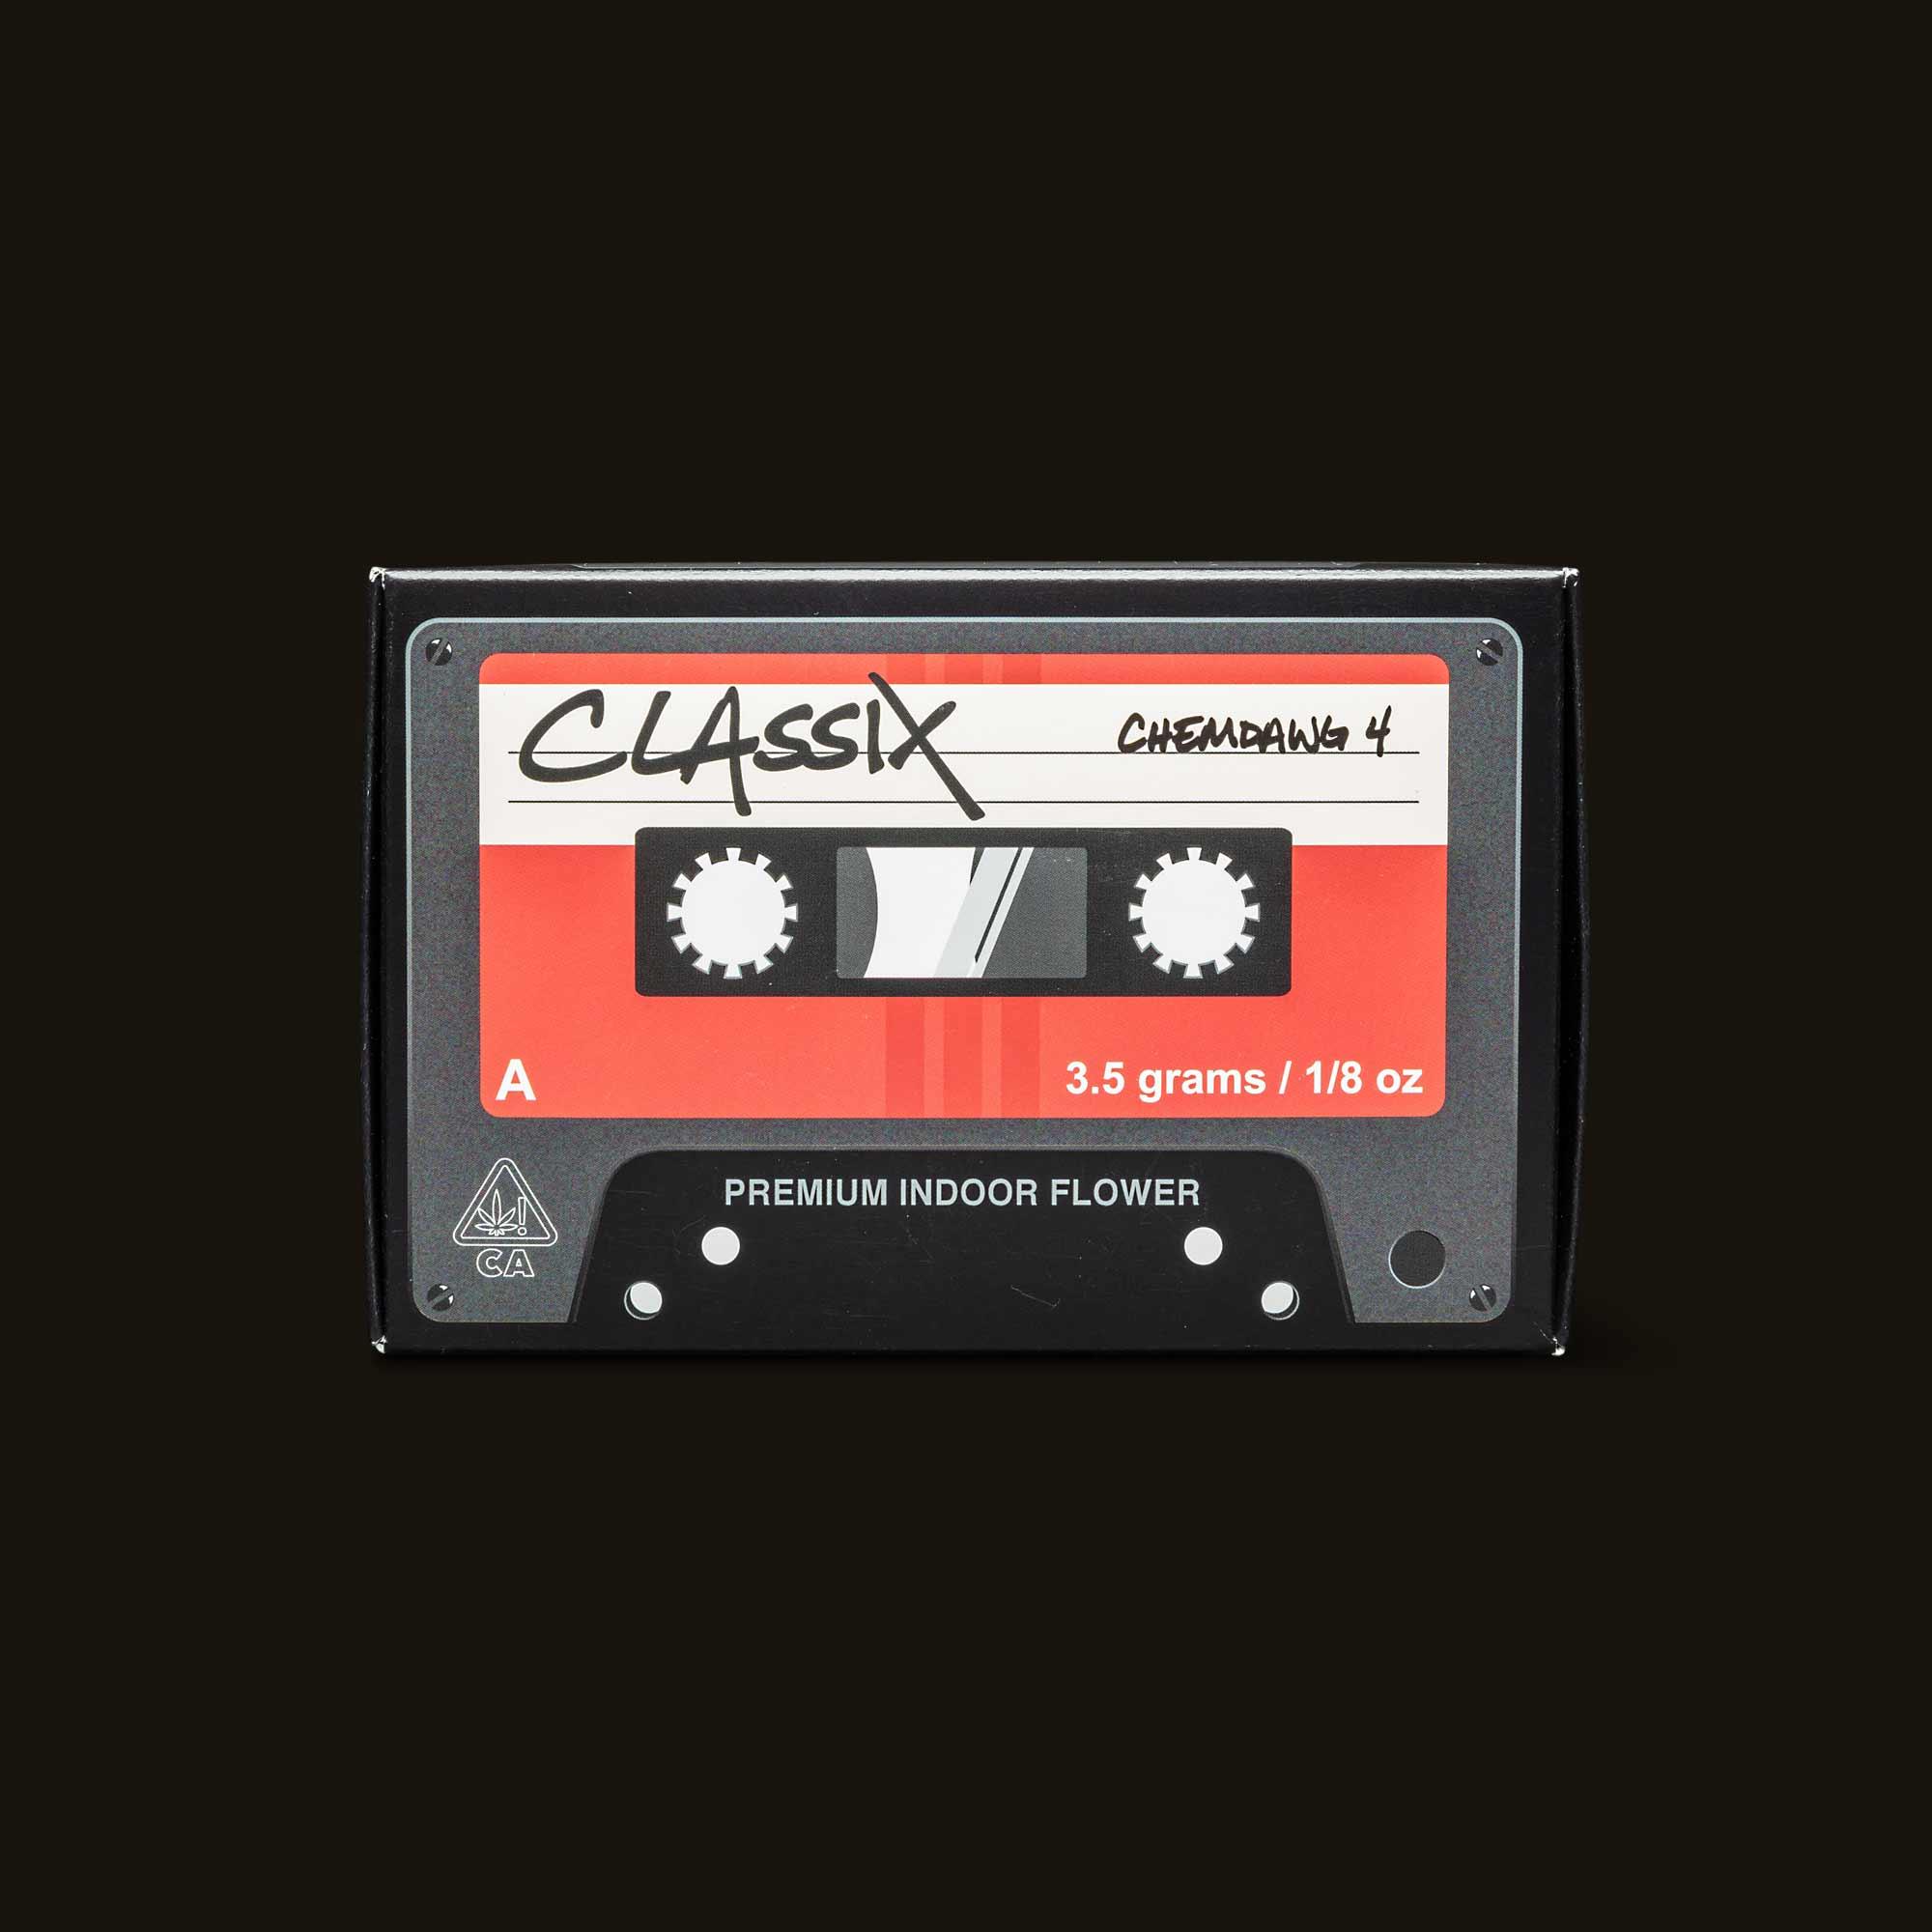 Classix Flower - Chemdawg 4